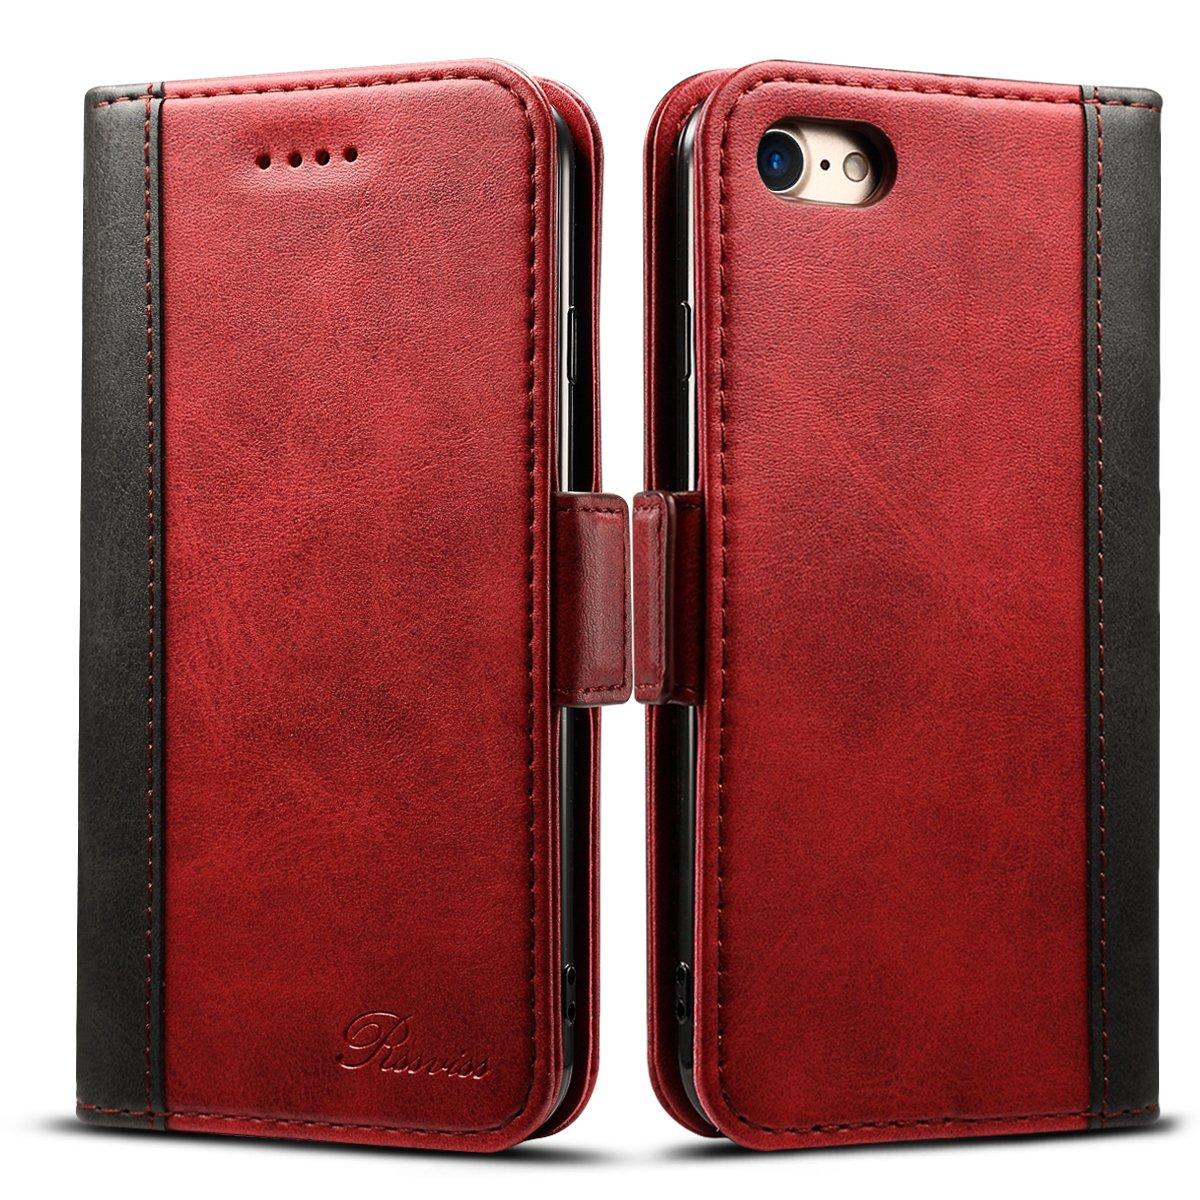 3de05a1cb0 iPhone8 ケース 手帳型 iPhone7ケース Rssviss アイフォン7 ケース iPhone 8 ケース ...